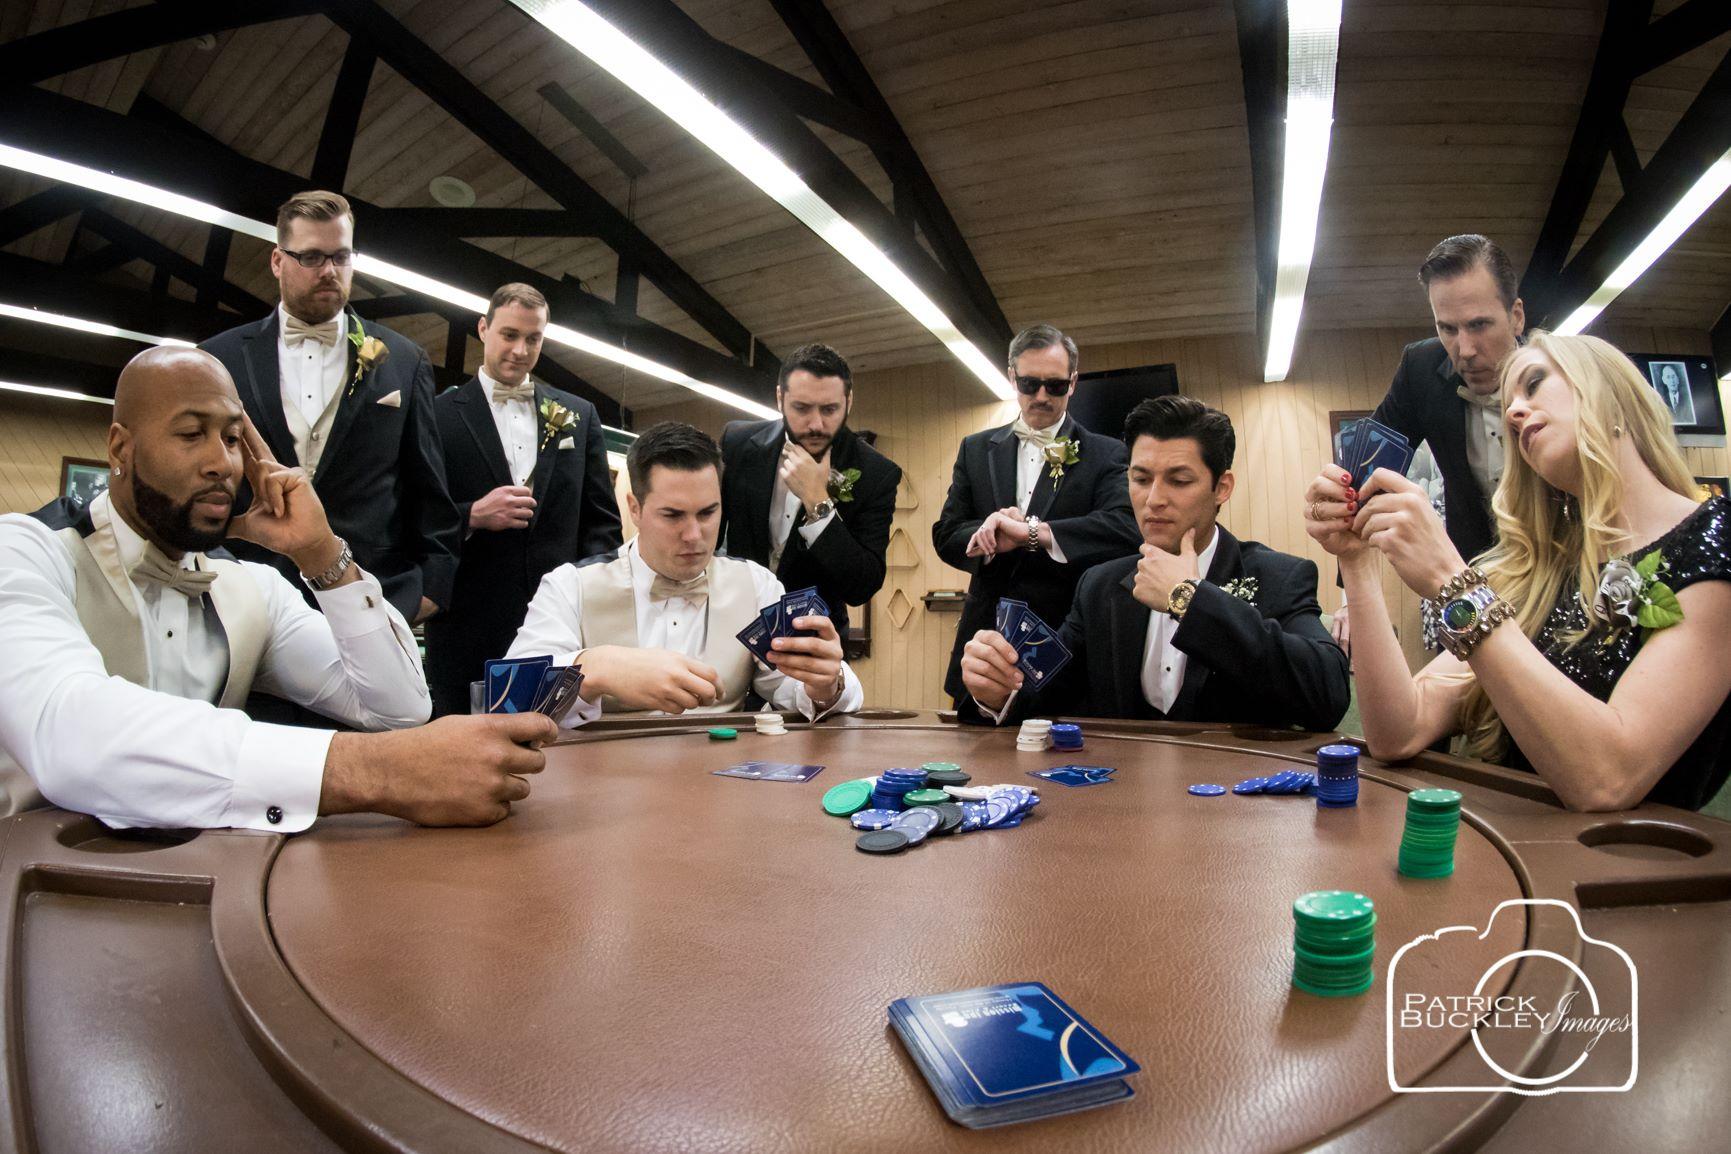 Groomsmen Betting on their wedding venue